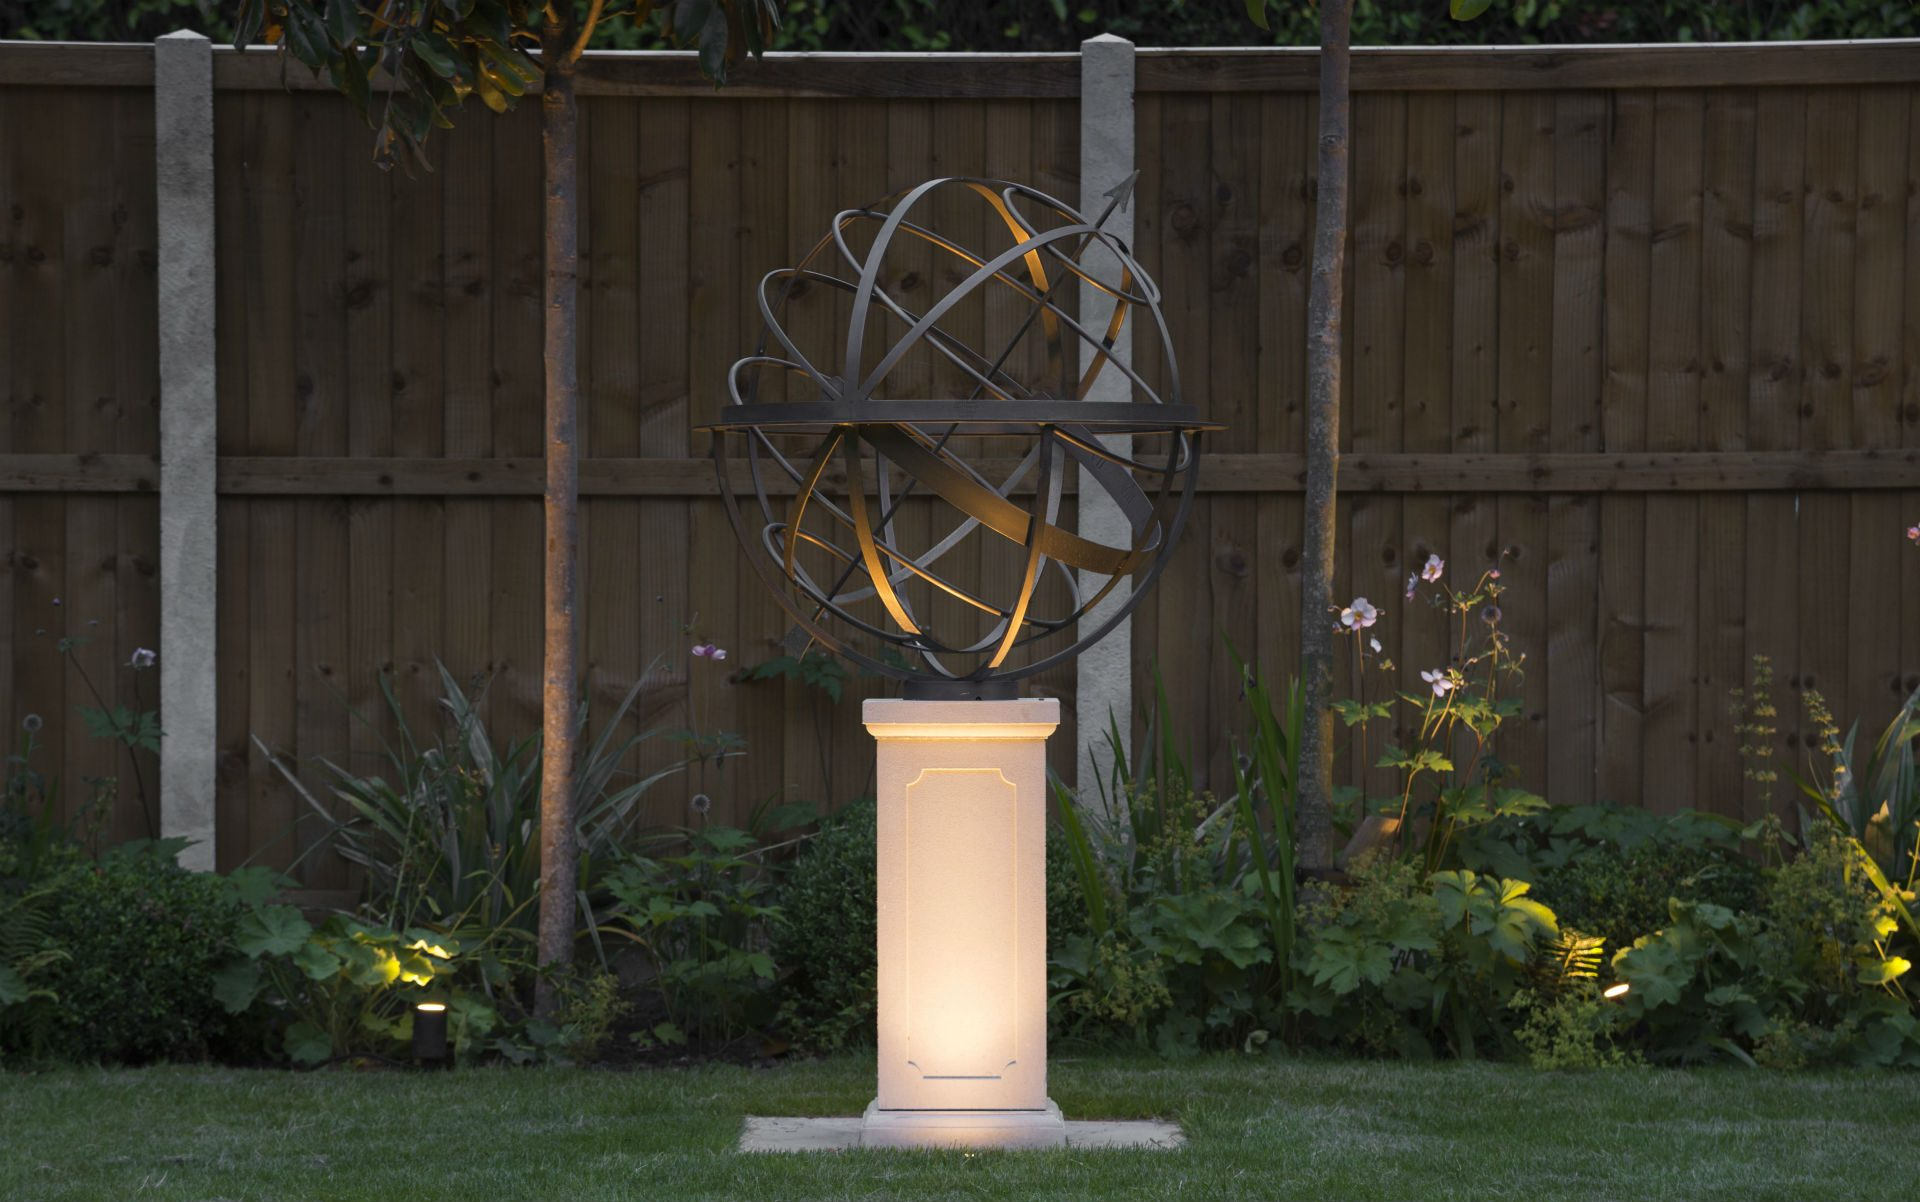 Contemporary Living Garden and Courtyard Shenfield Essex David Harber Sundial